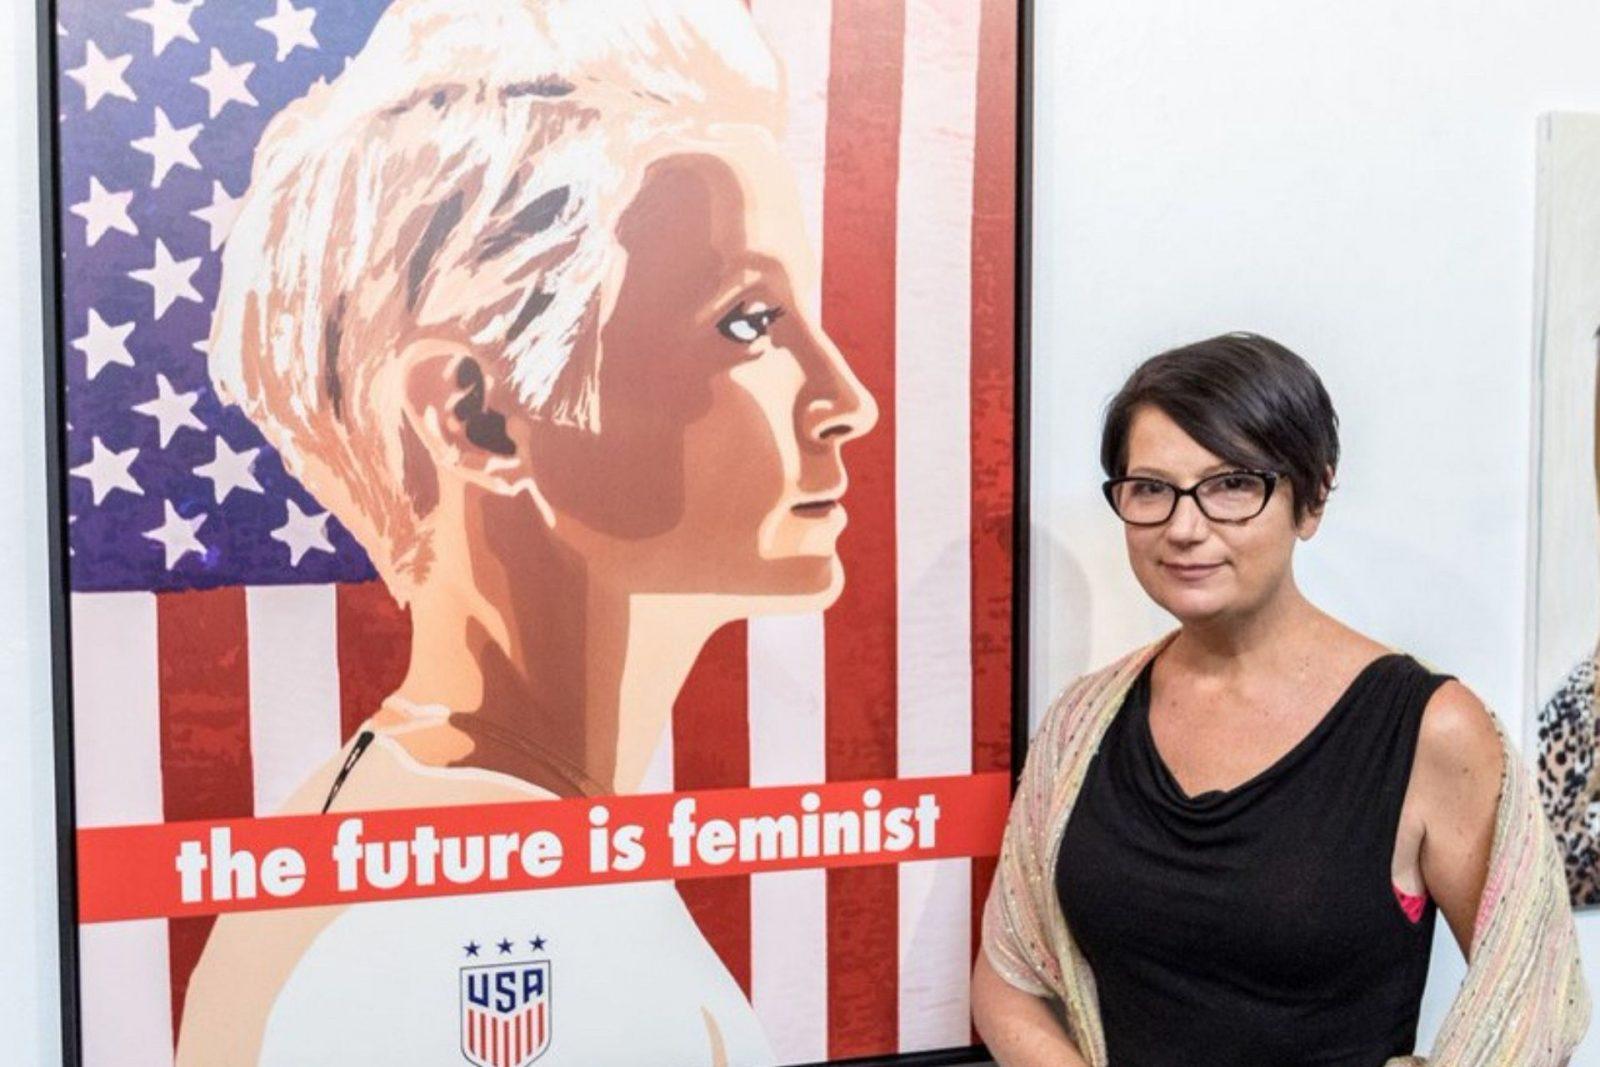 activist artist Karen Fiorito